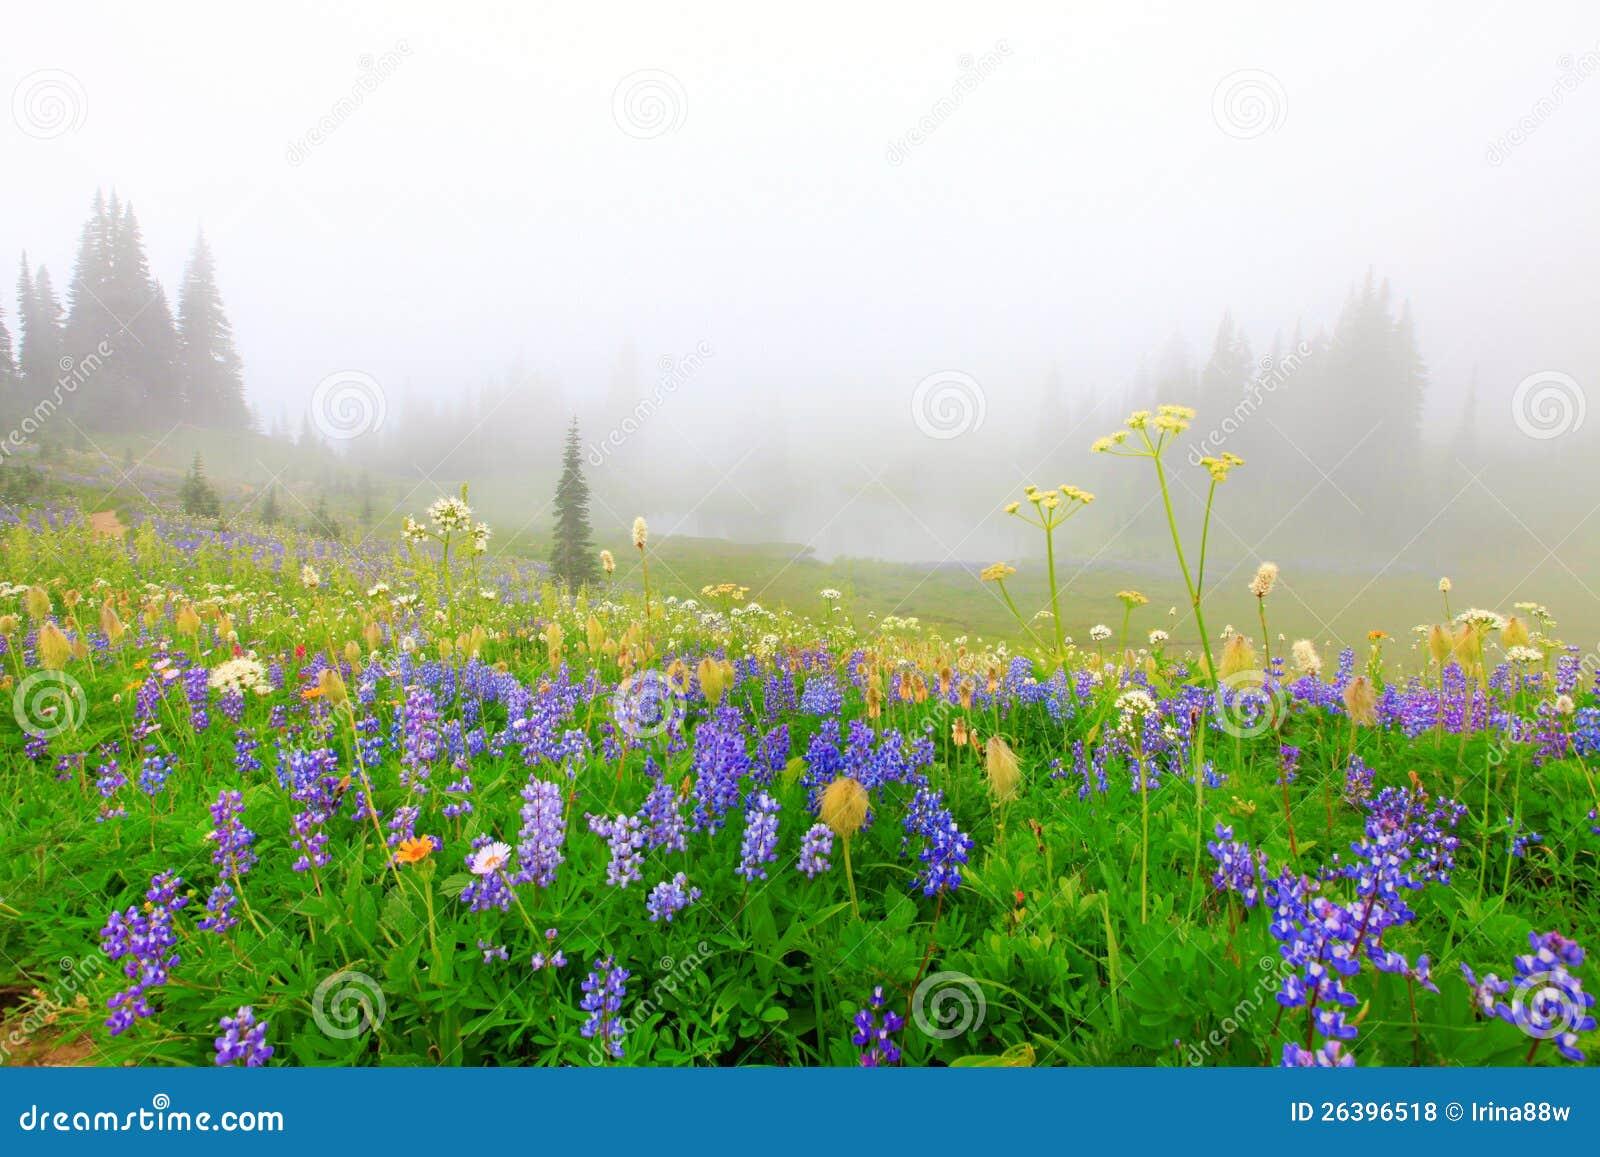 Beautiful wild flowers field with lake stock photo image of download beautiful wild flowers field with lake stock photo image of rainier blue izmirmasajfo